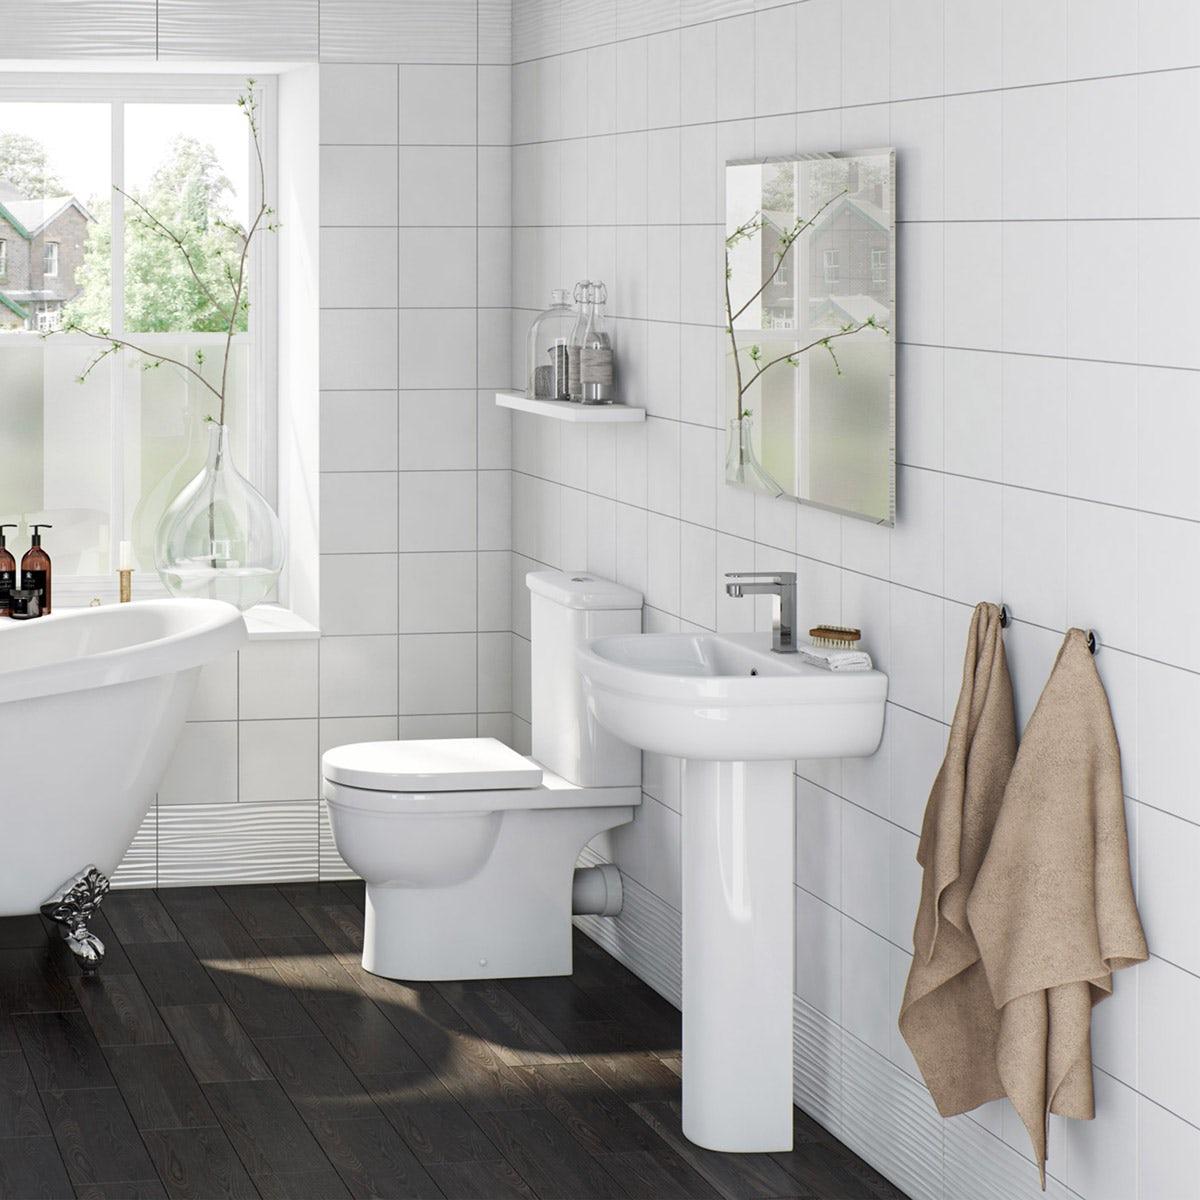 Deco Bathroom Suite Range